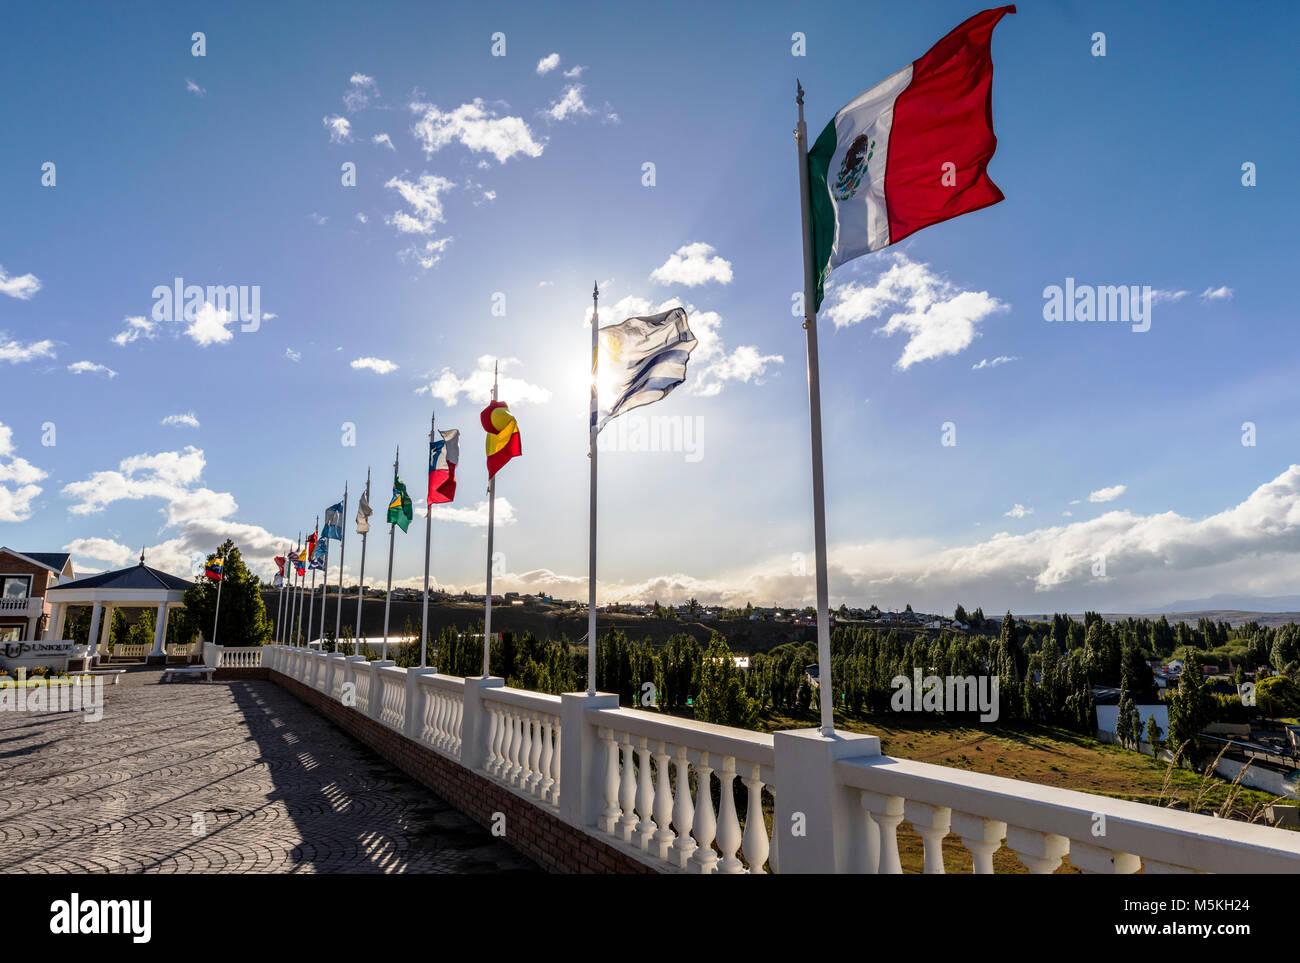 National flags festival stock photos national flags for Hotel unique luxury calafate tripadvisor